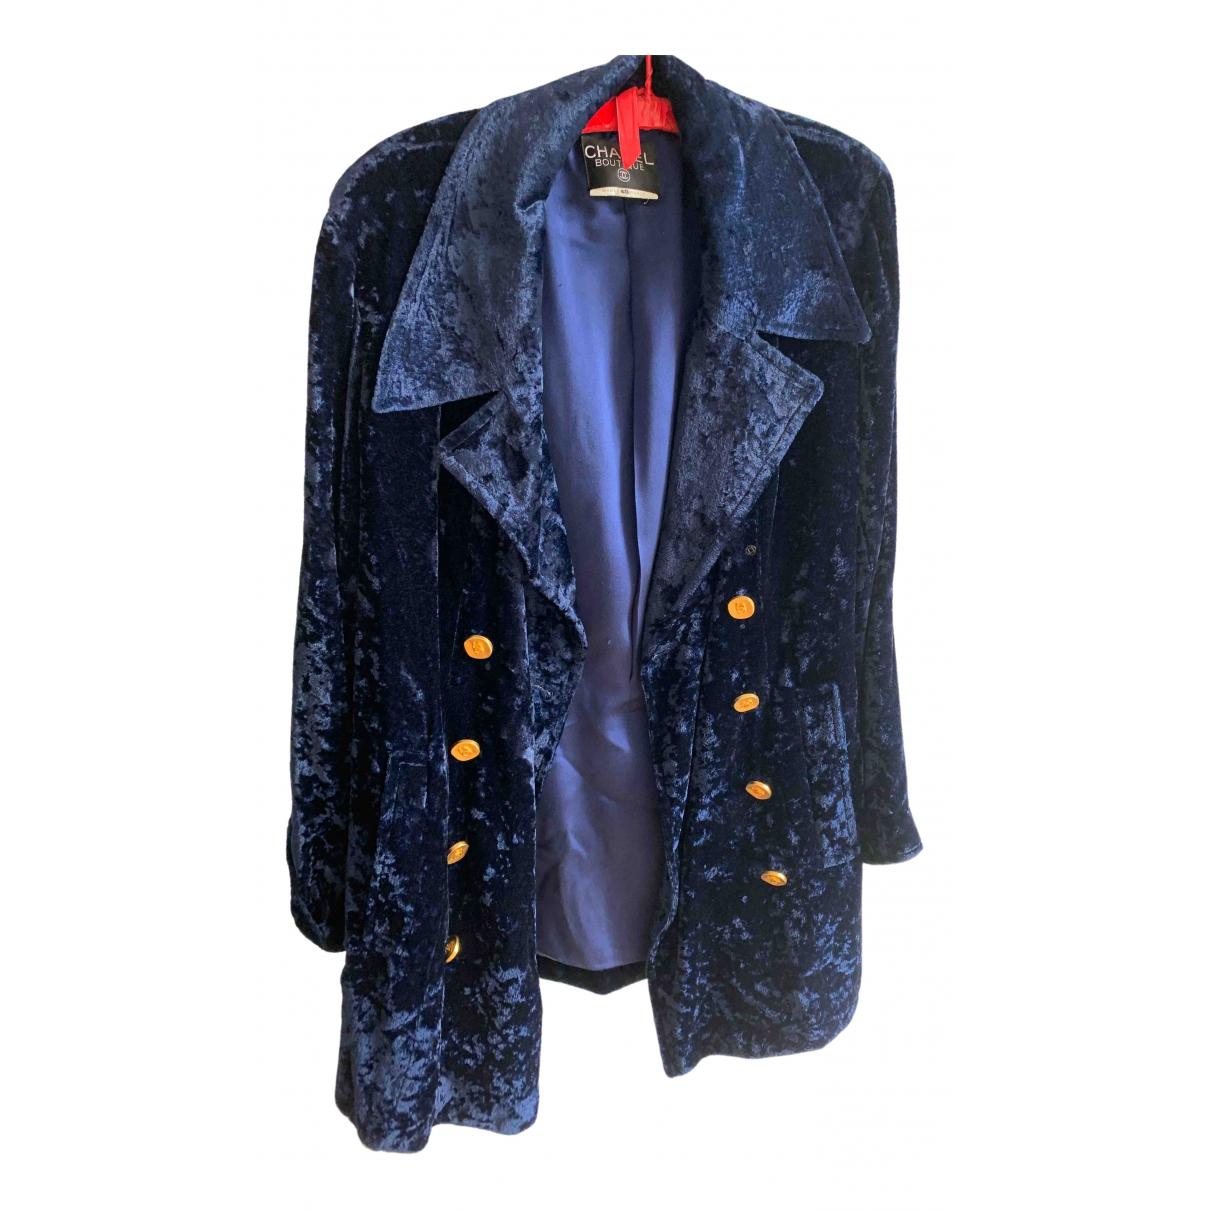 Chanel \N Jacke in  Blau Viskose